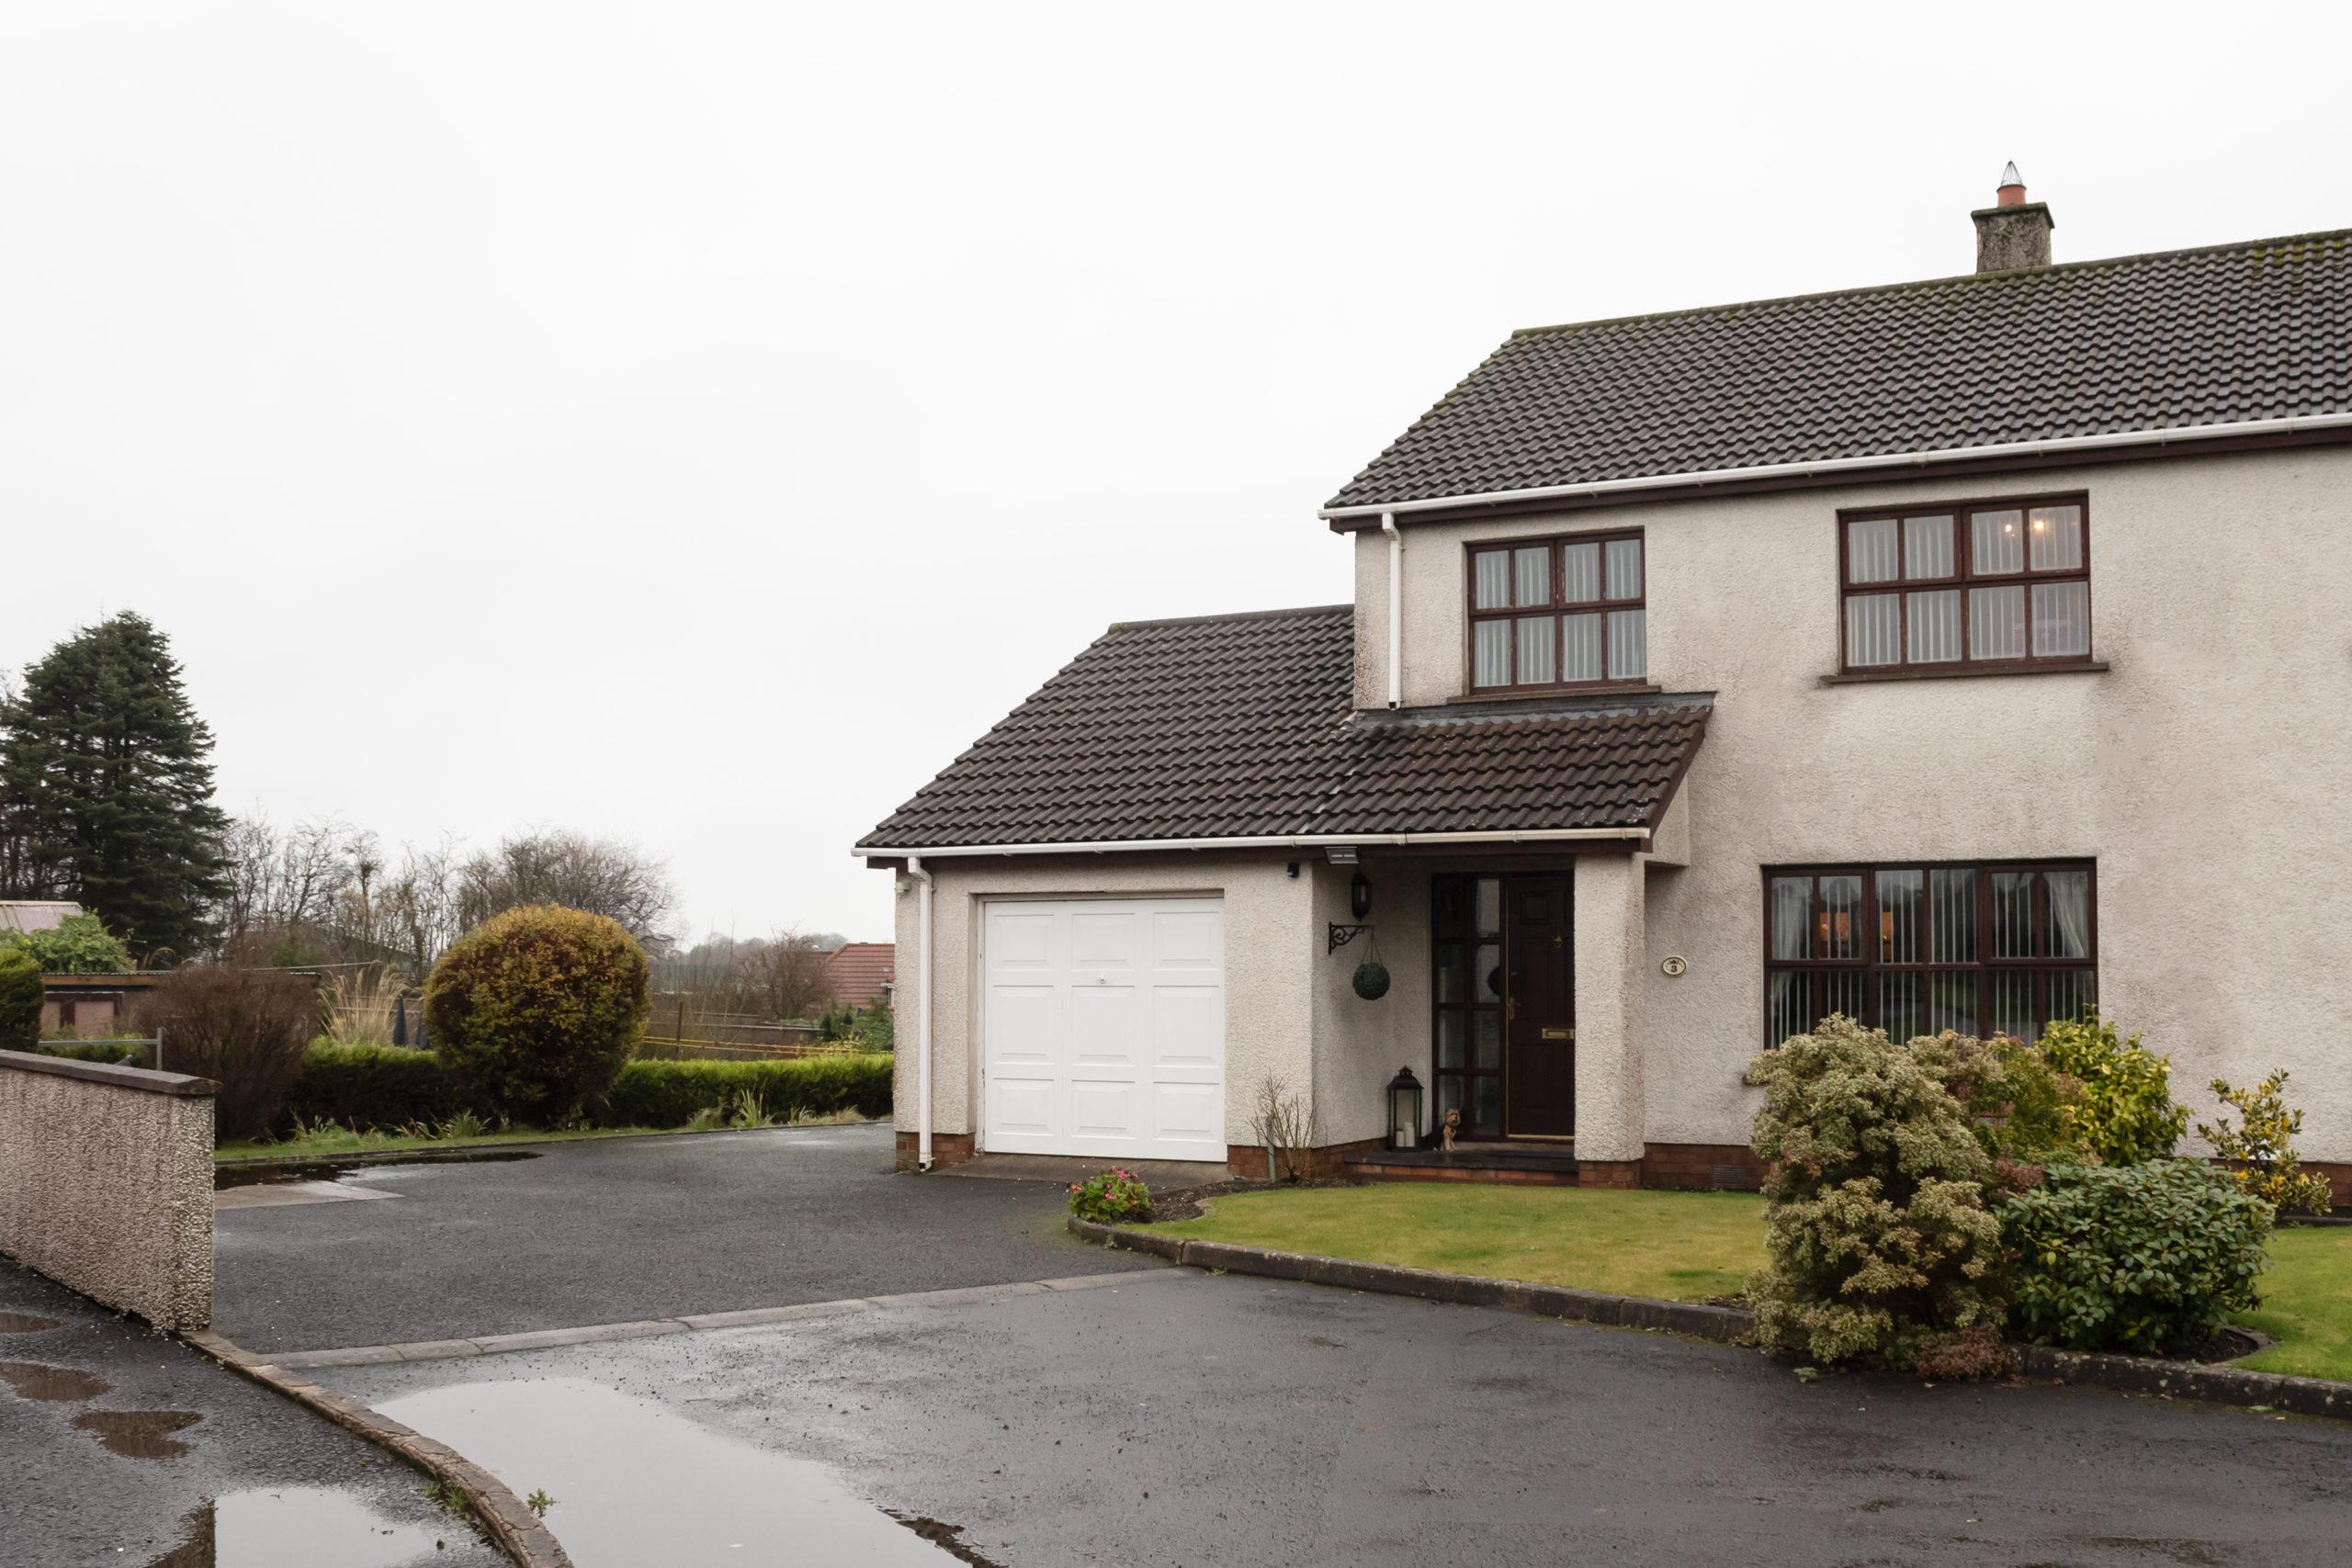 Image of 3 Fourtowns Crescent, Ahoghill, Ballymena, Co Antrim, BT42 1RT